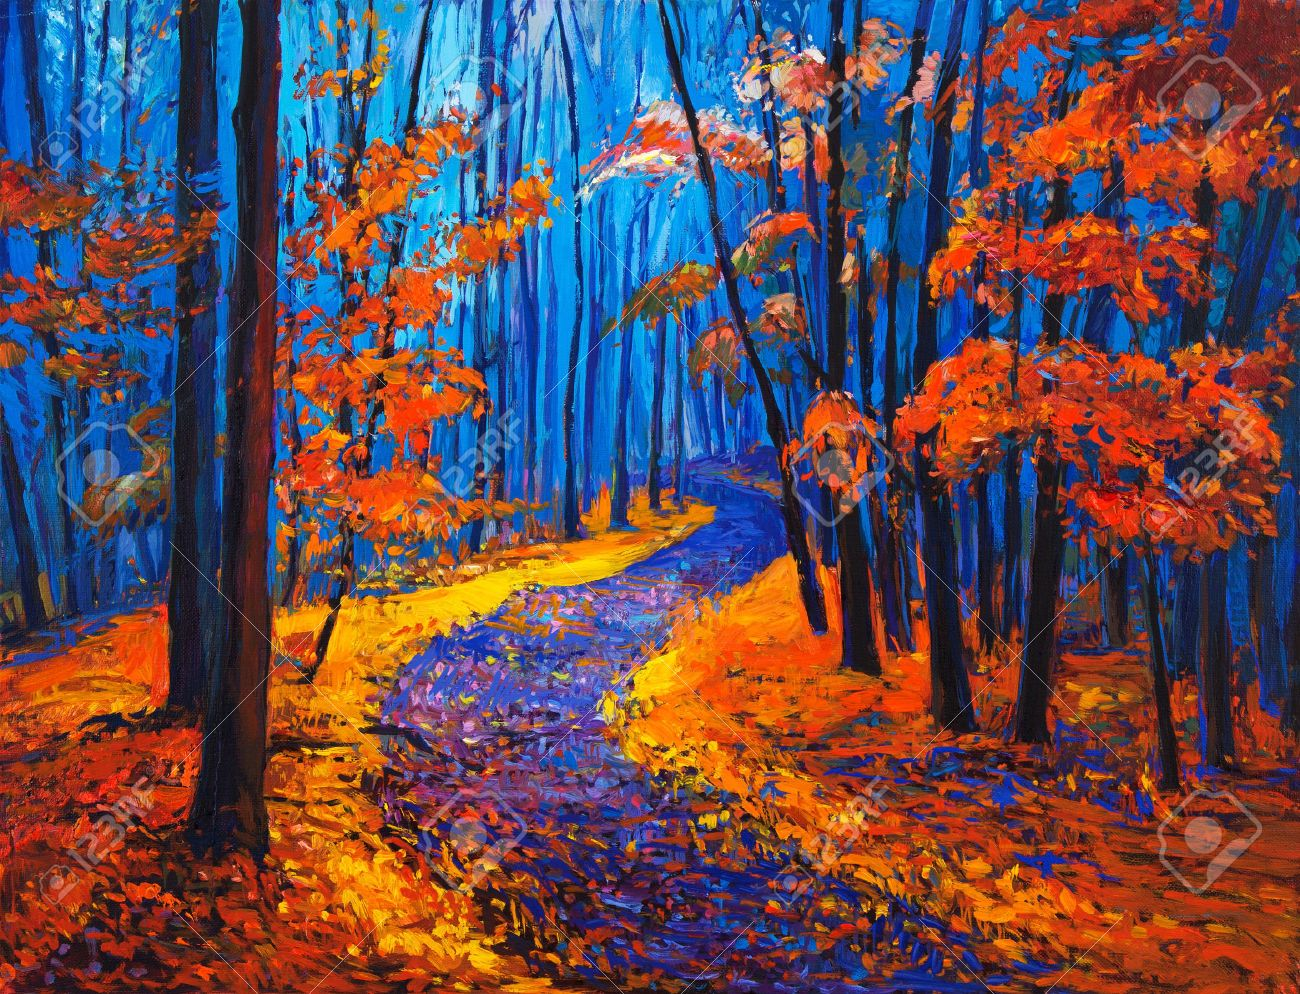 Pintura Al Oleo Original Mostrando Hermoso Bosque De Otono Sobre Lienzo Impresionismo Moderno Bosque Otono Pintura Al Oleo Cuadro De Otono